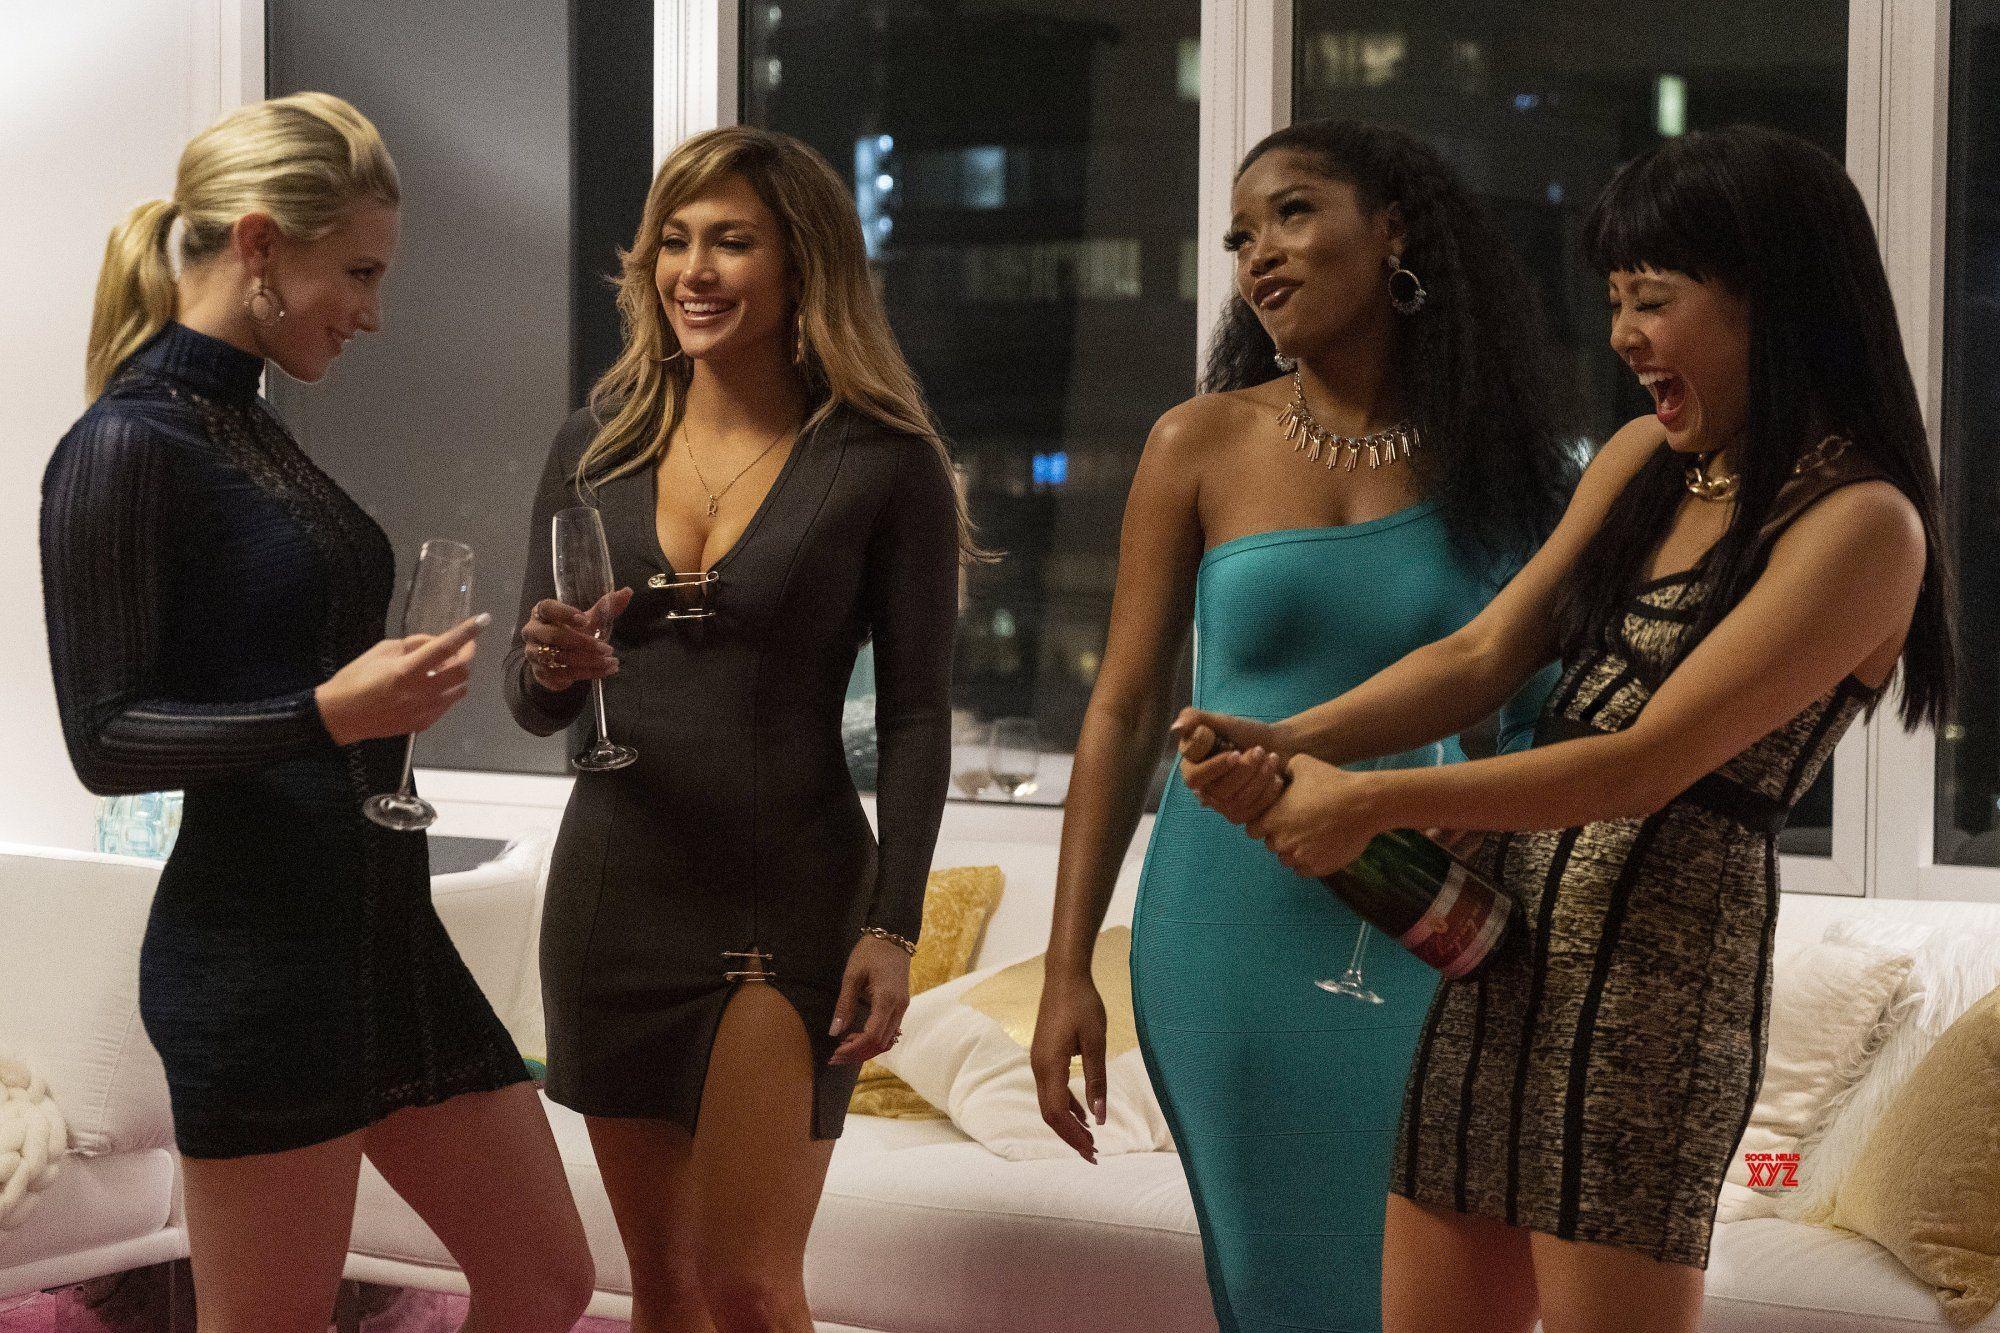 Jennifer Lopez, Cardi B, and Lizzo Rob Wall Street Bros in the Hustlers Trailer